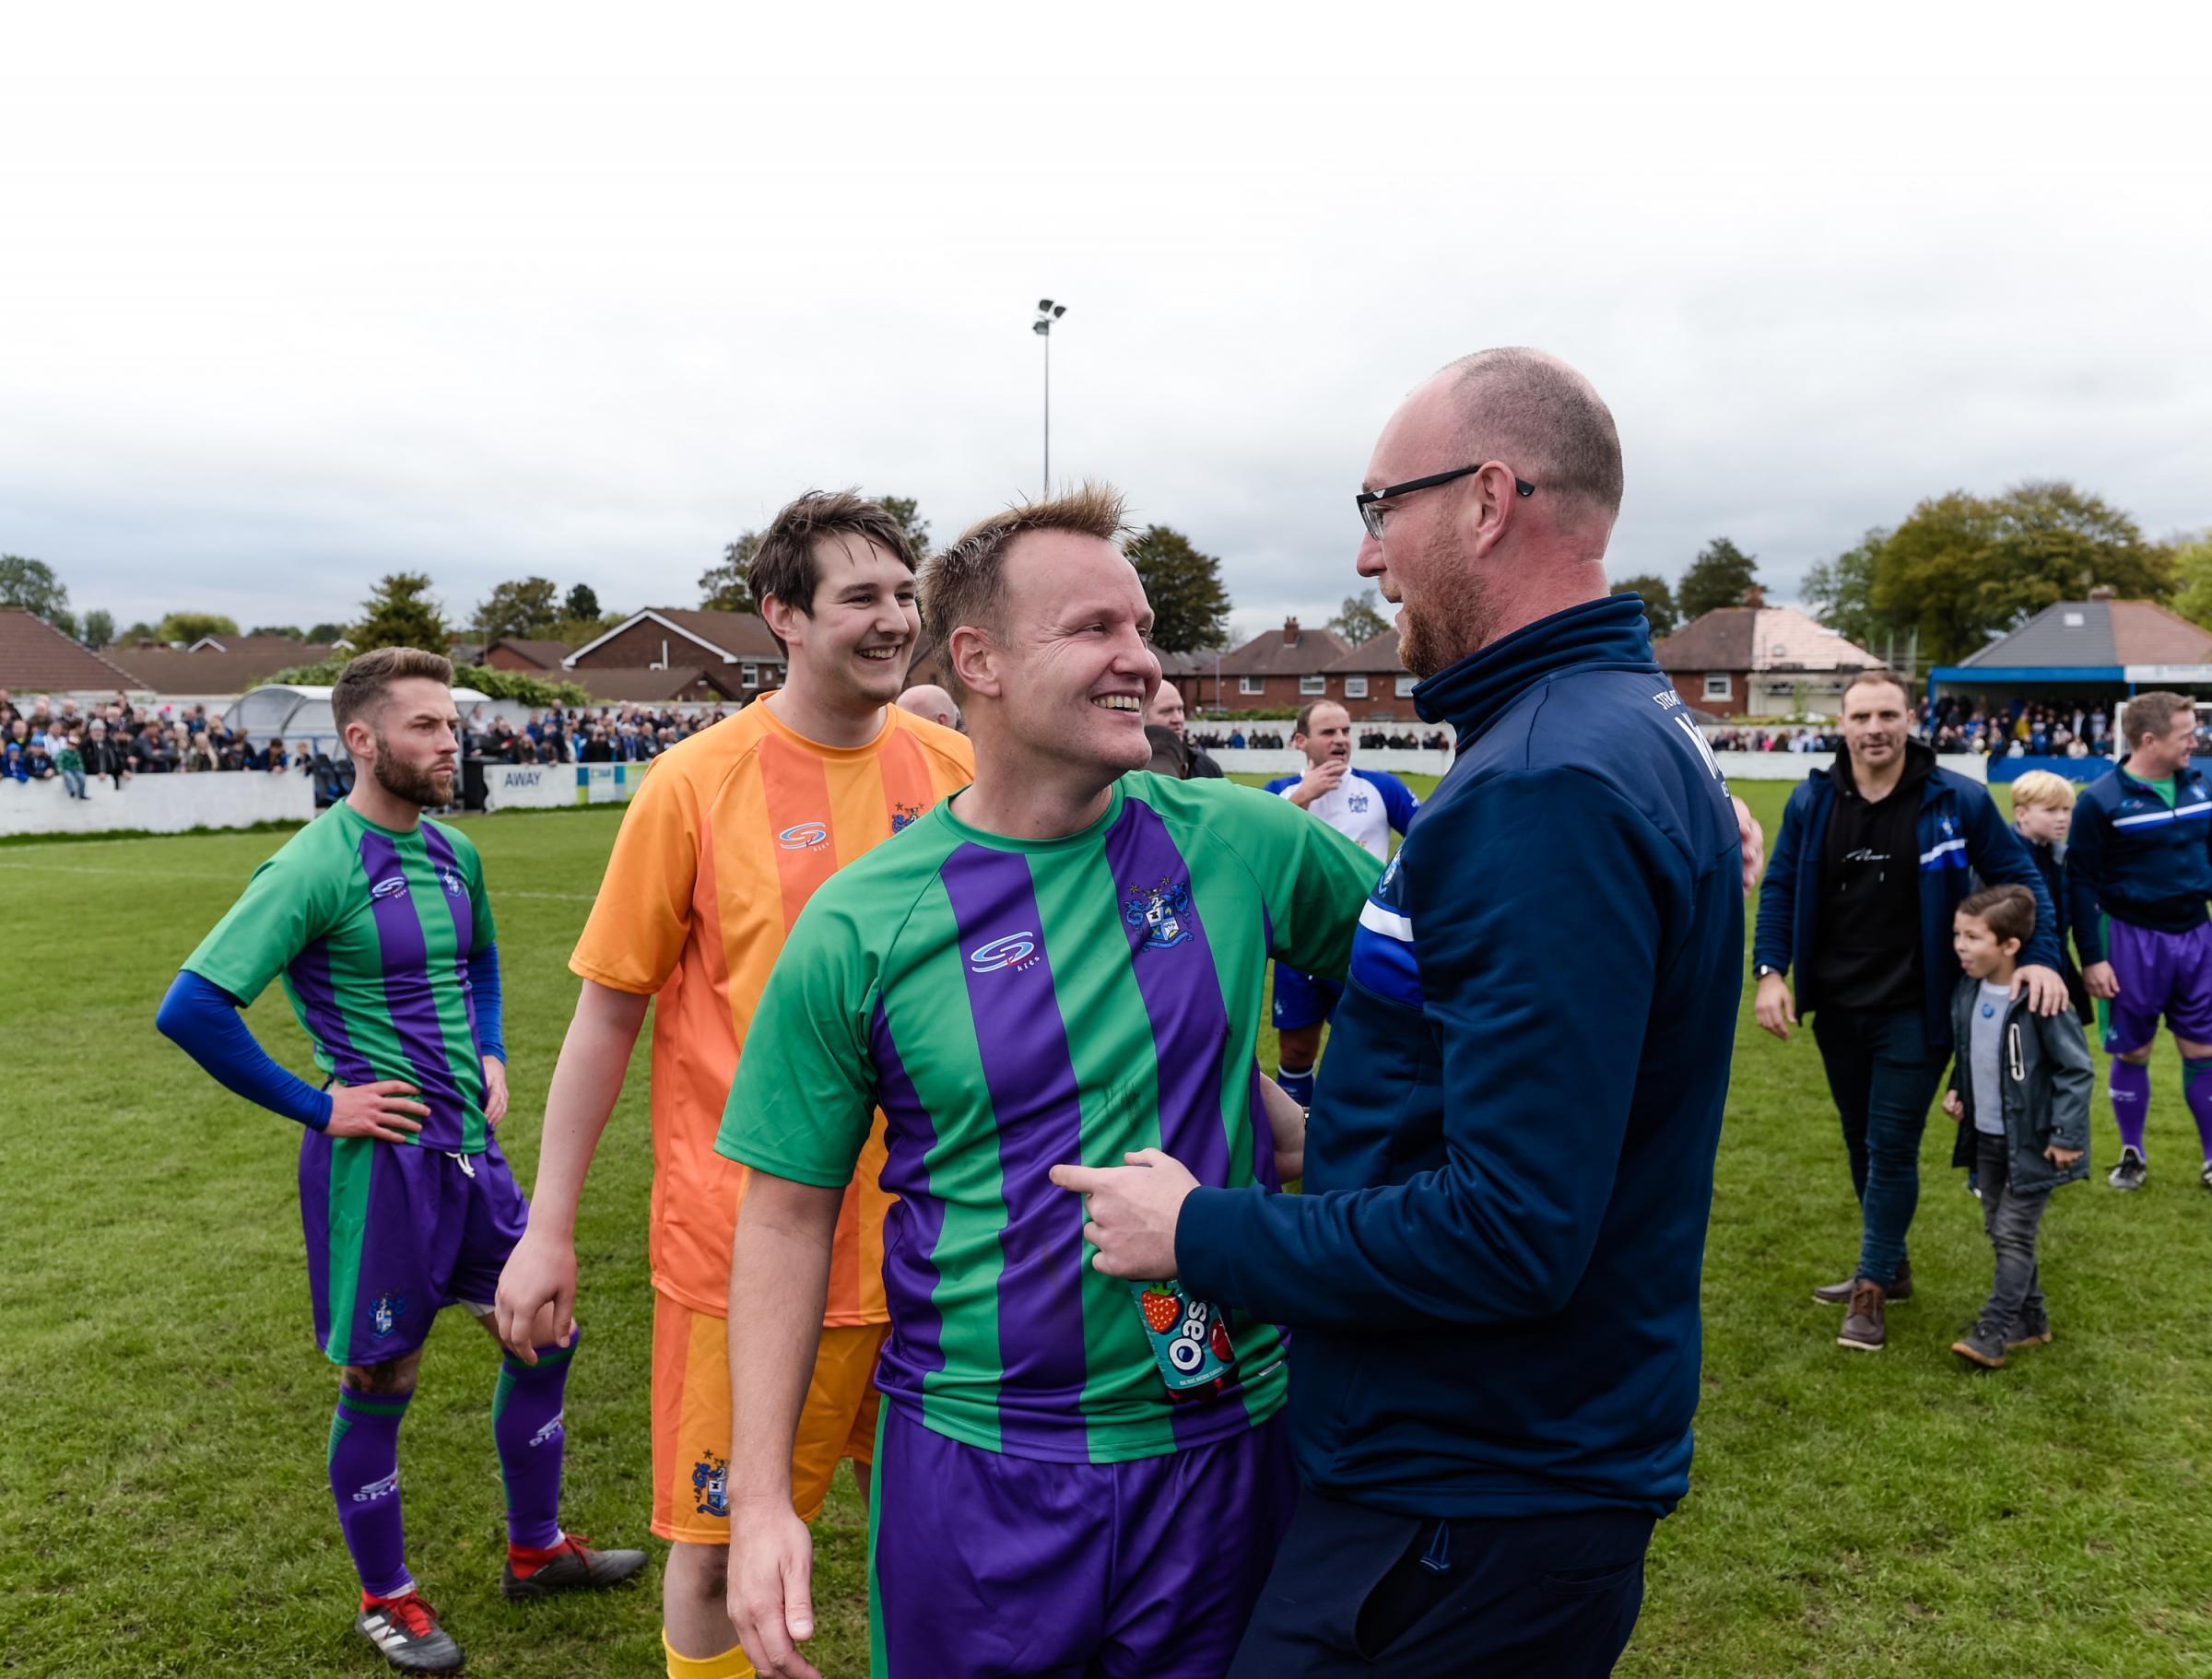 Bury phoenix club encouraged by initial membership response